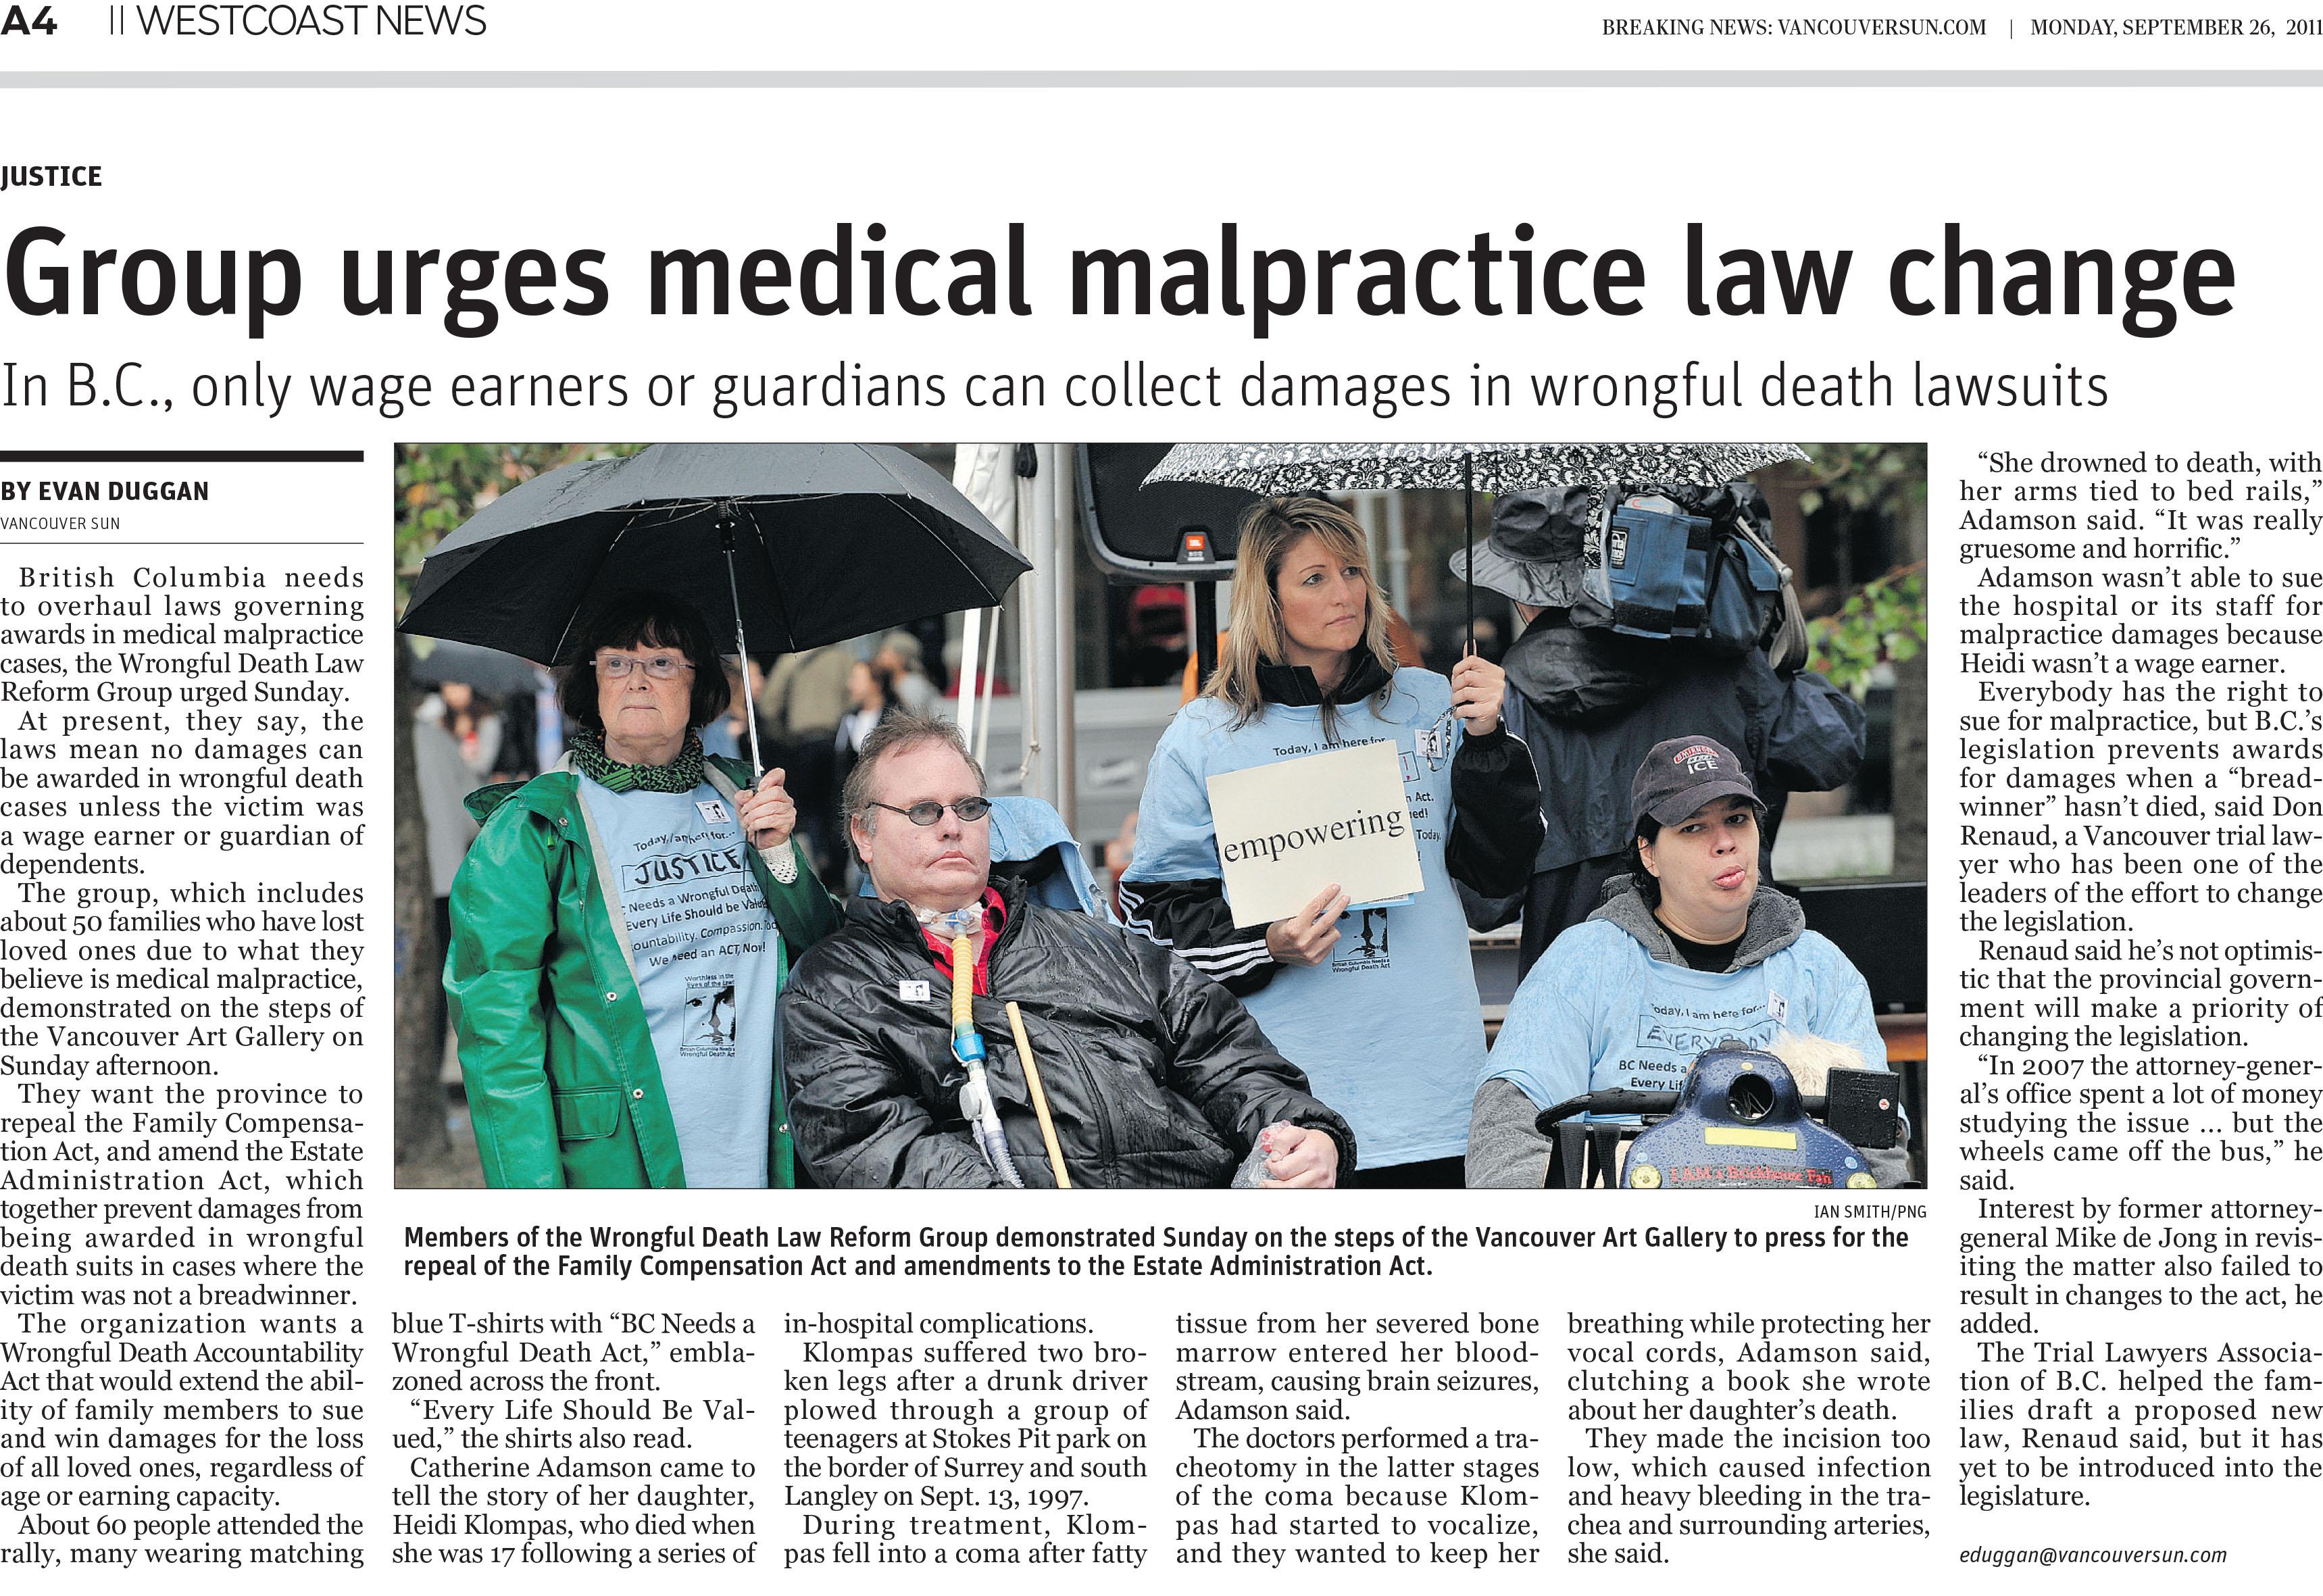 Vancouver_Sun_-_Group_urges_medical_malpractice_law_change_-_26SEP11